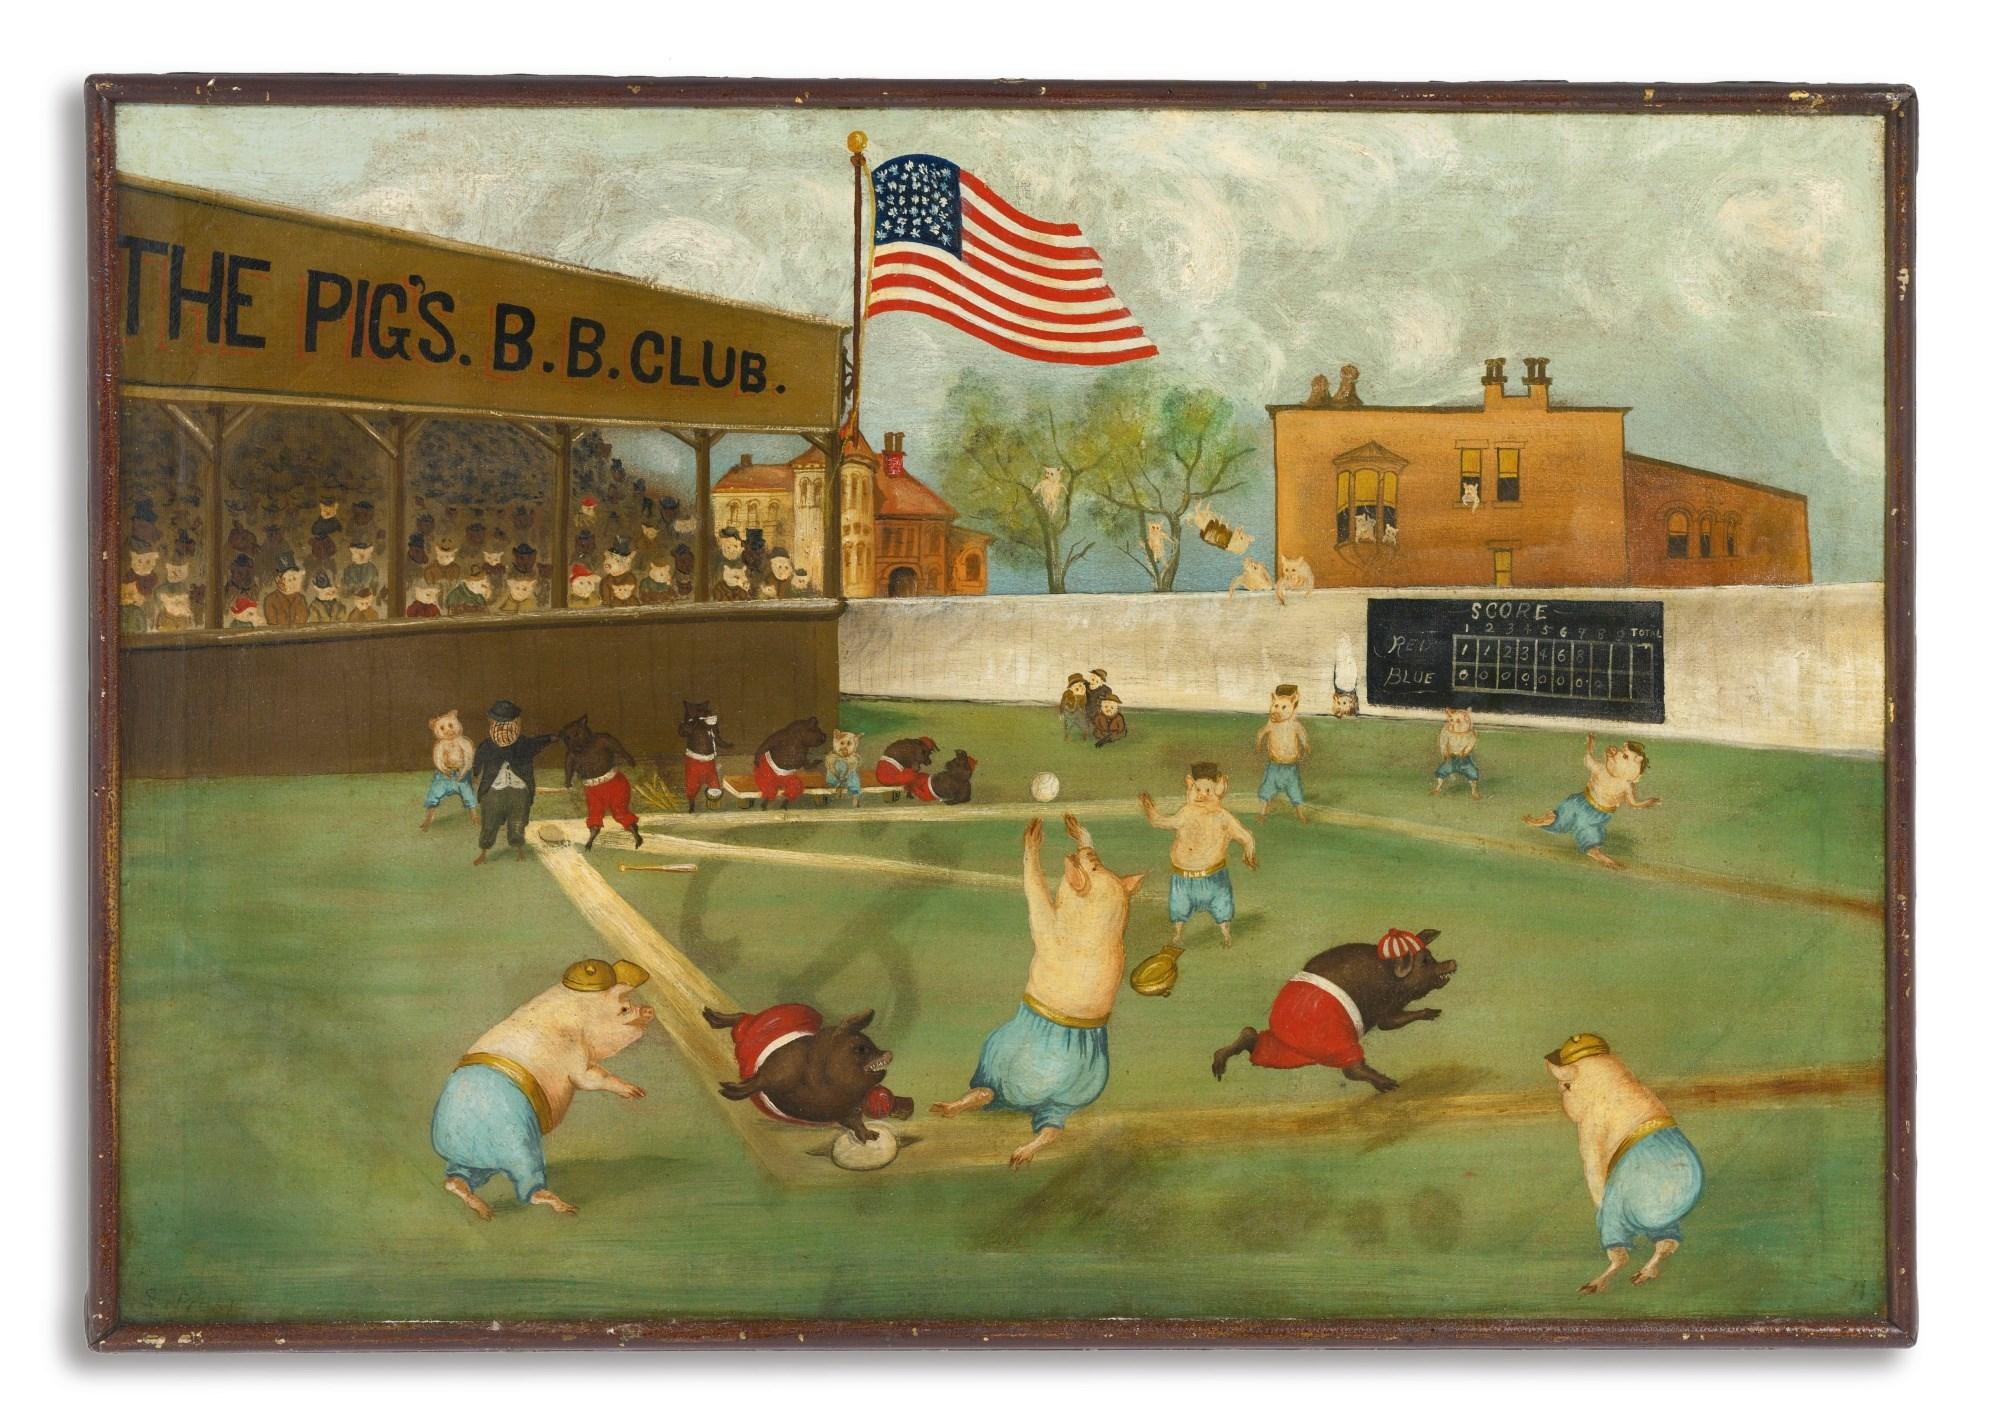 The Pigs Baseball Club Ca 1890 21 x 30